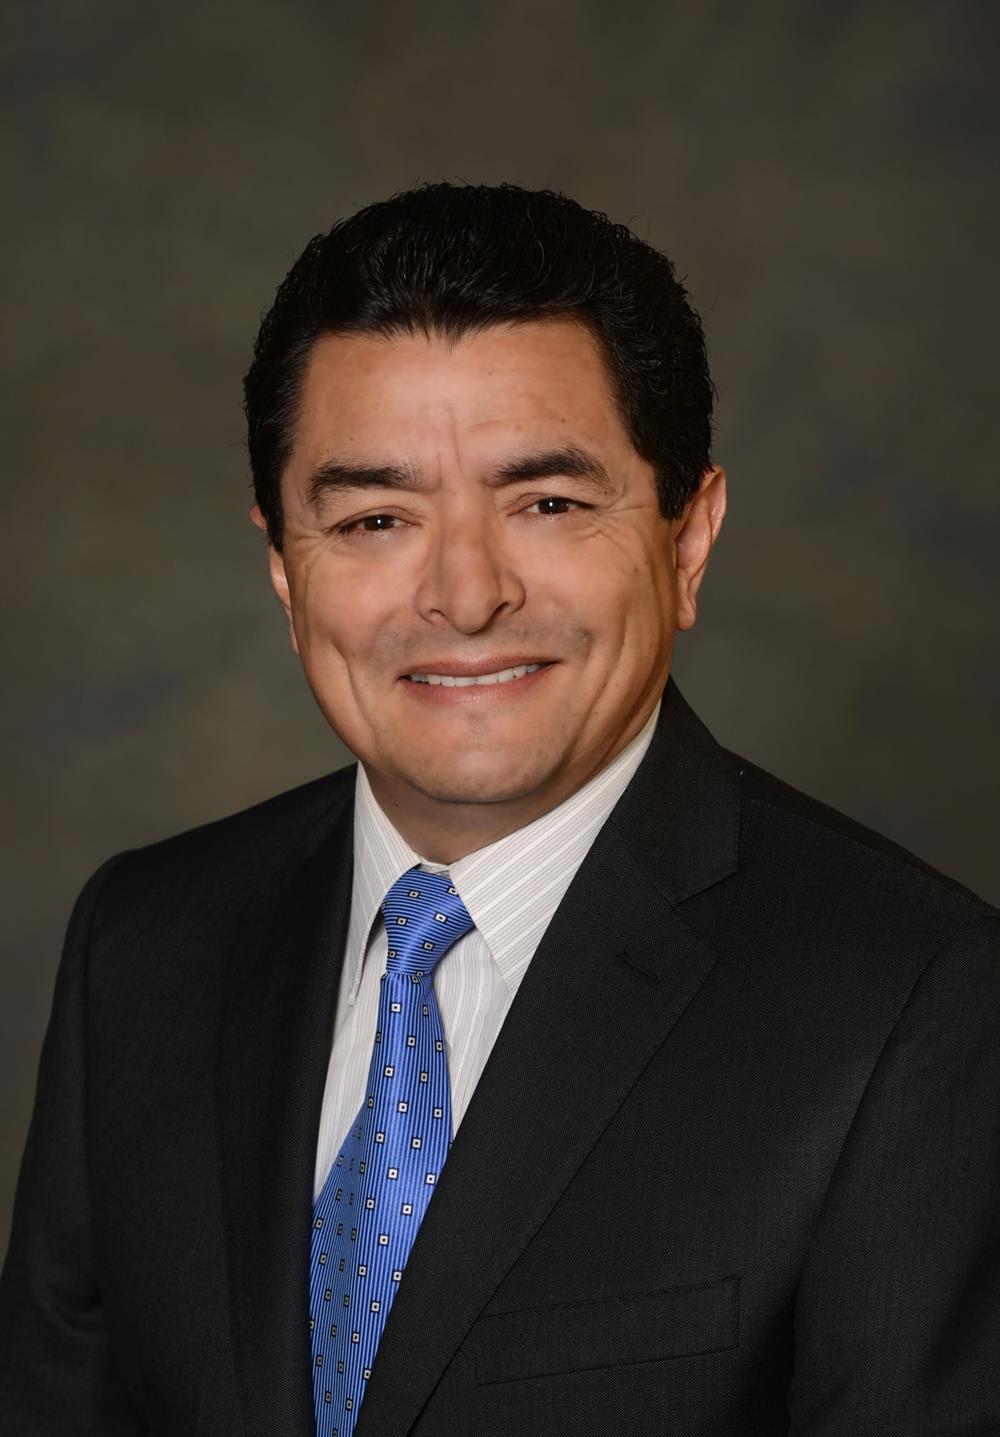 Carlos-Carrasco-REP in Mexico